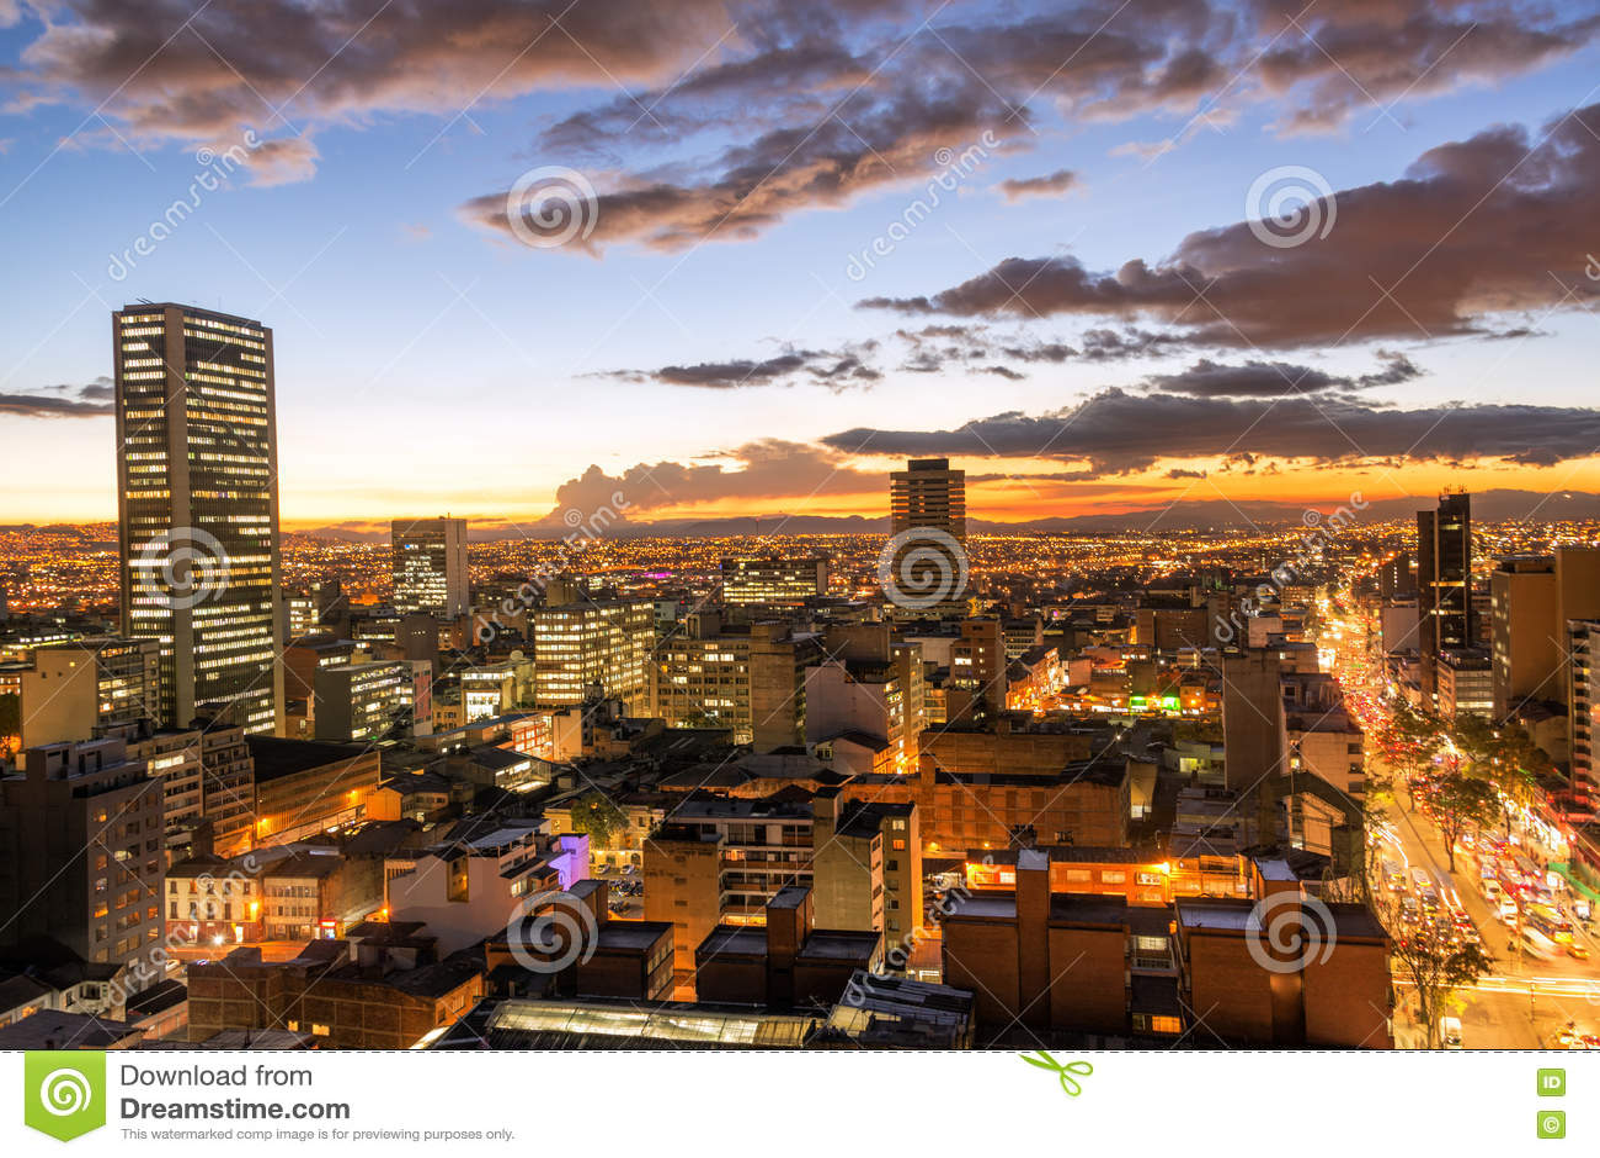 Bogota, Colombia at Dusk